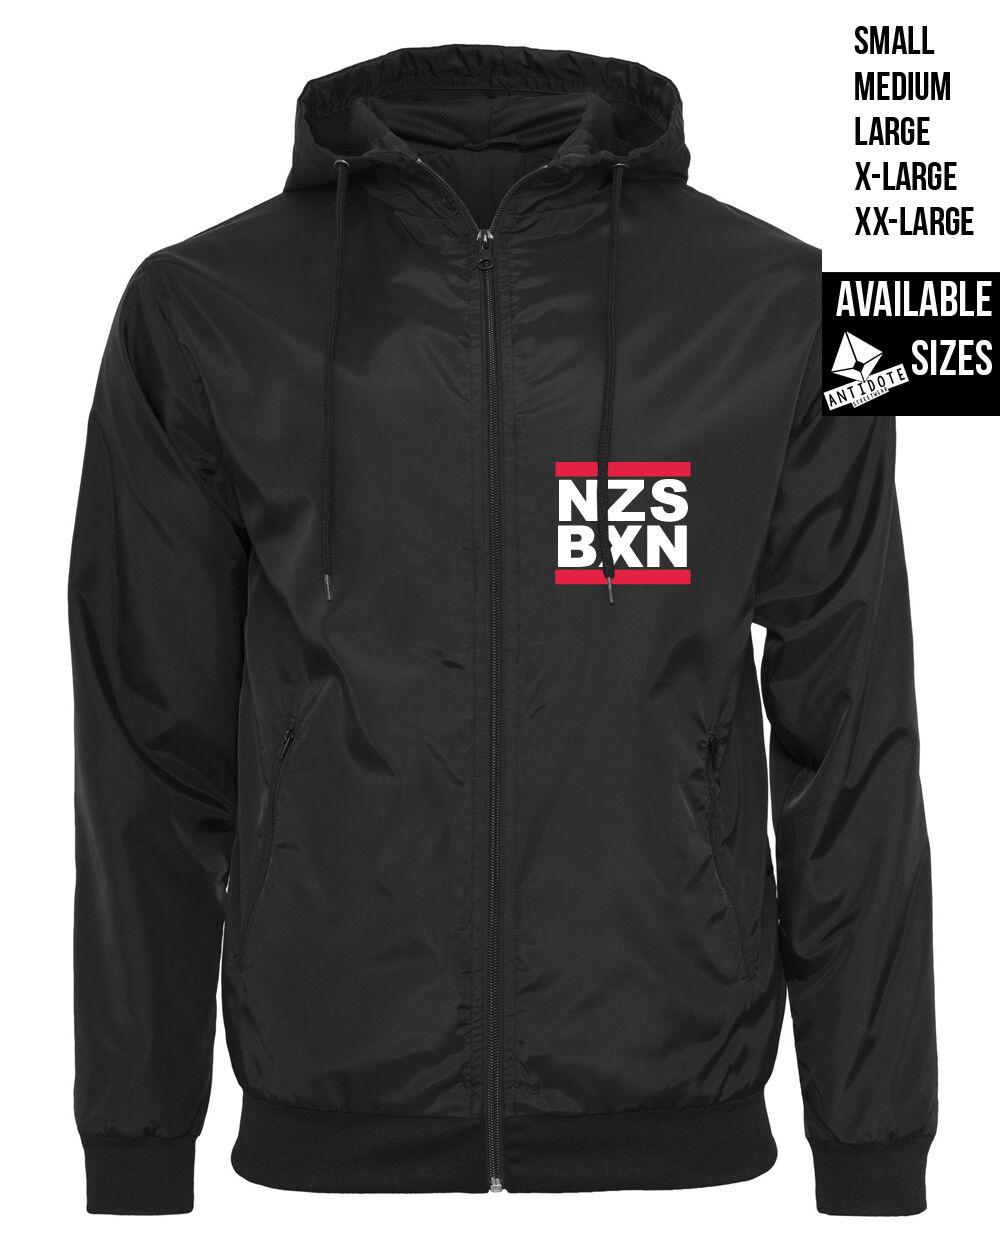 NZS BXN   WINDBREAKER  Antidote Streetwear Nazis Boxen Antifa Straight Edge Punk